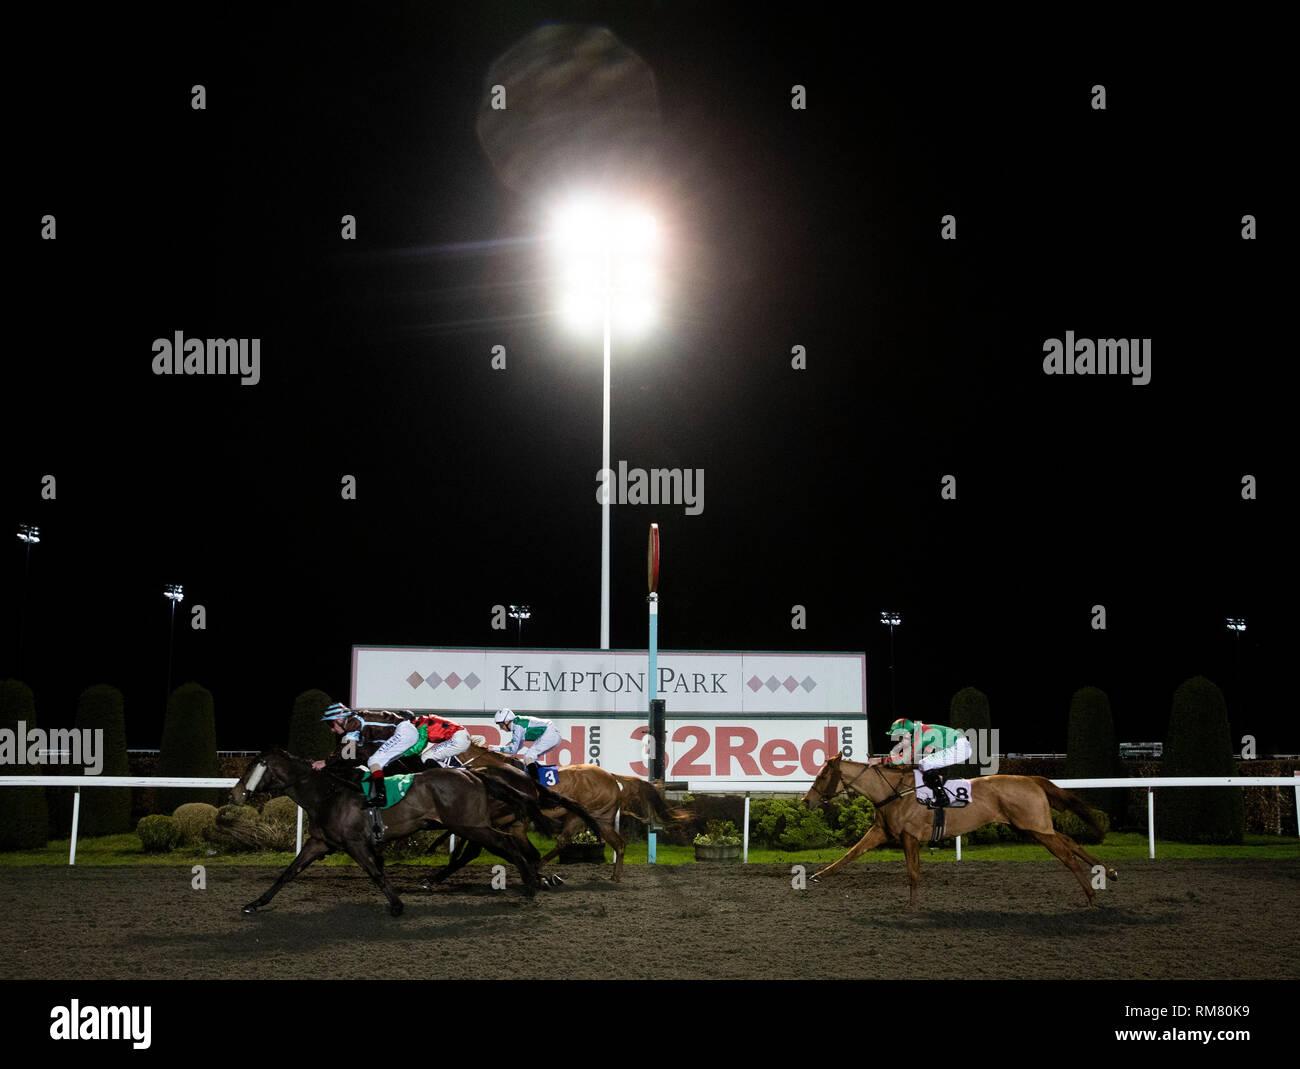 Chica De La Noche (nearside) ridden by Adam Kirby wins the 100% Profit Boost at 32Redsport.com Fillies' handicap stakes at Kempton Park Racecourse, Esher. - Stock Image